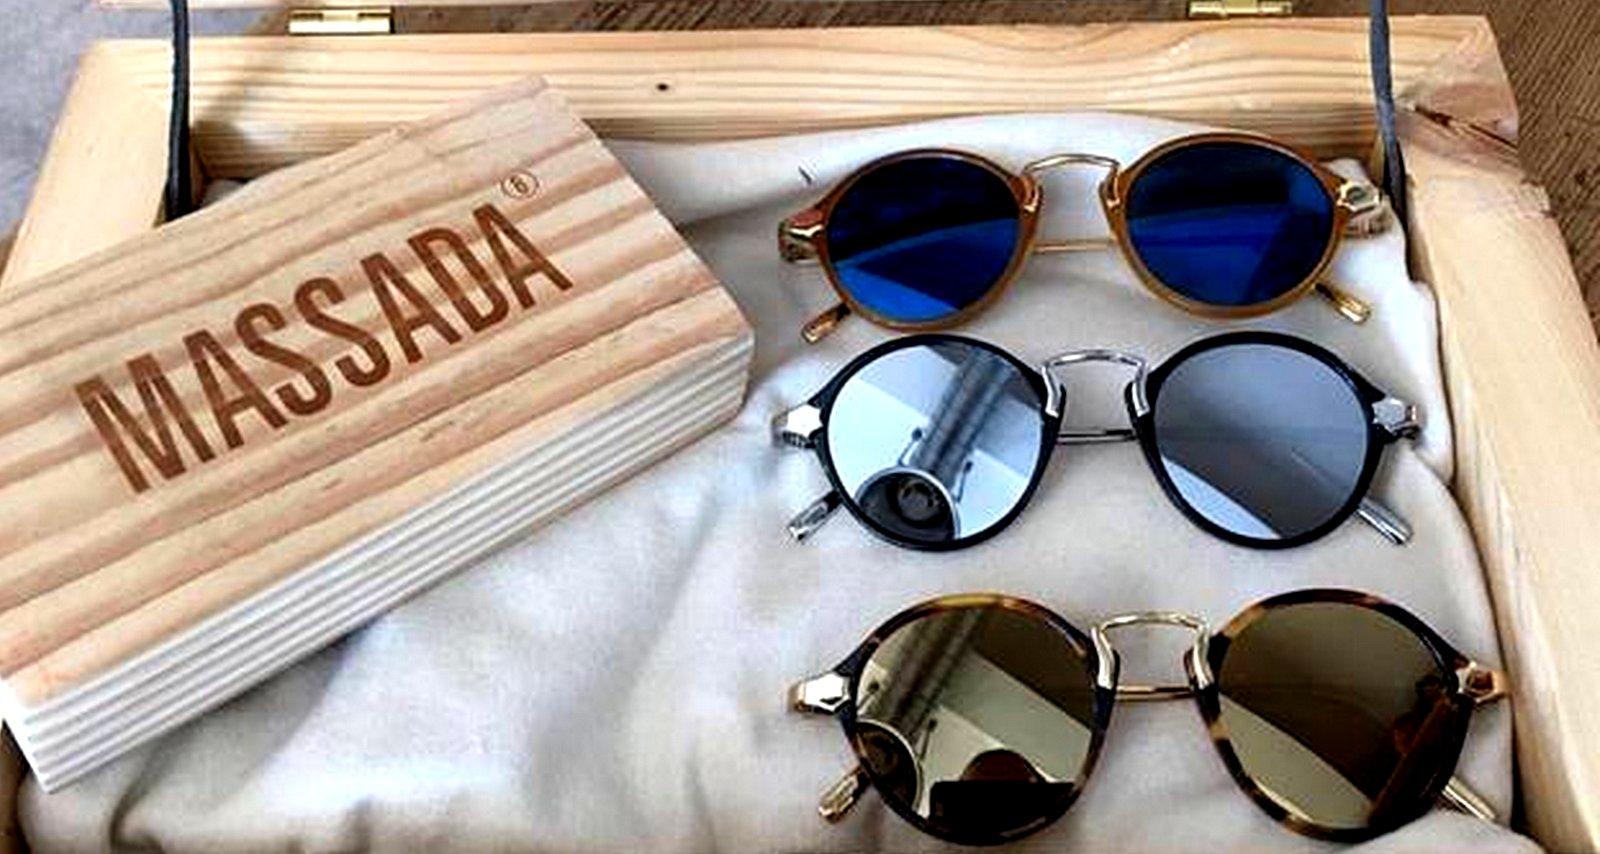 New Wynwood Gem: Zthea Sunglasses